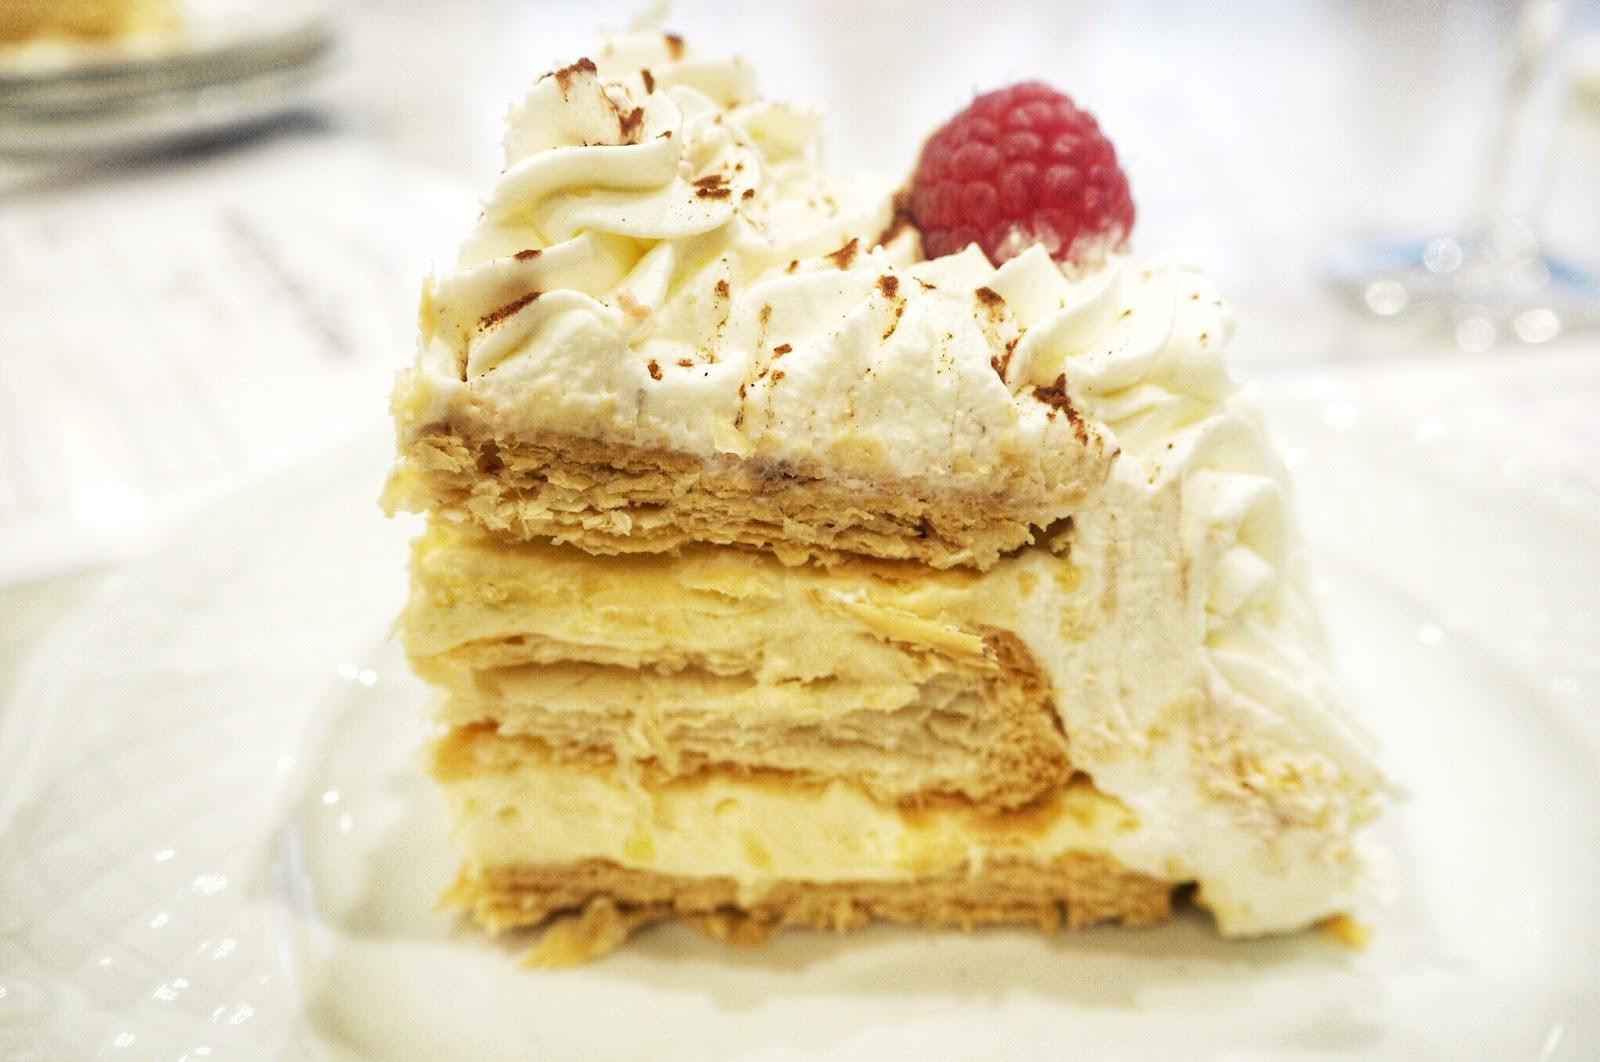 Fruit topped Italian wedding cake serving